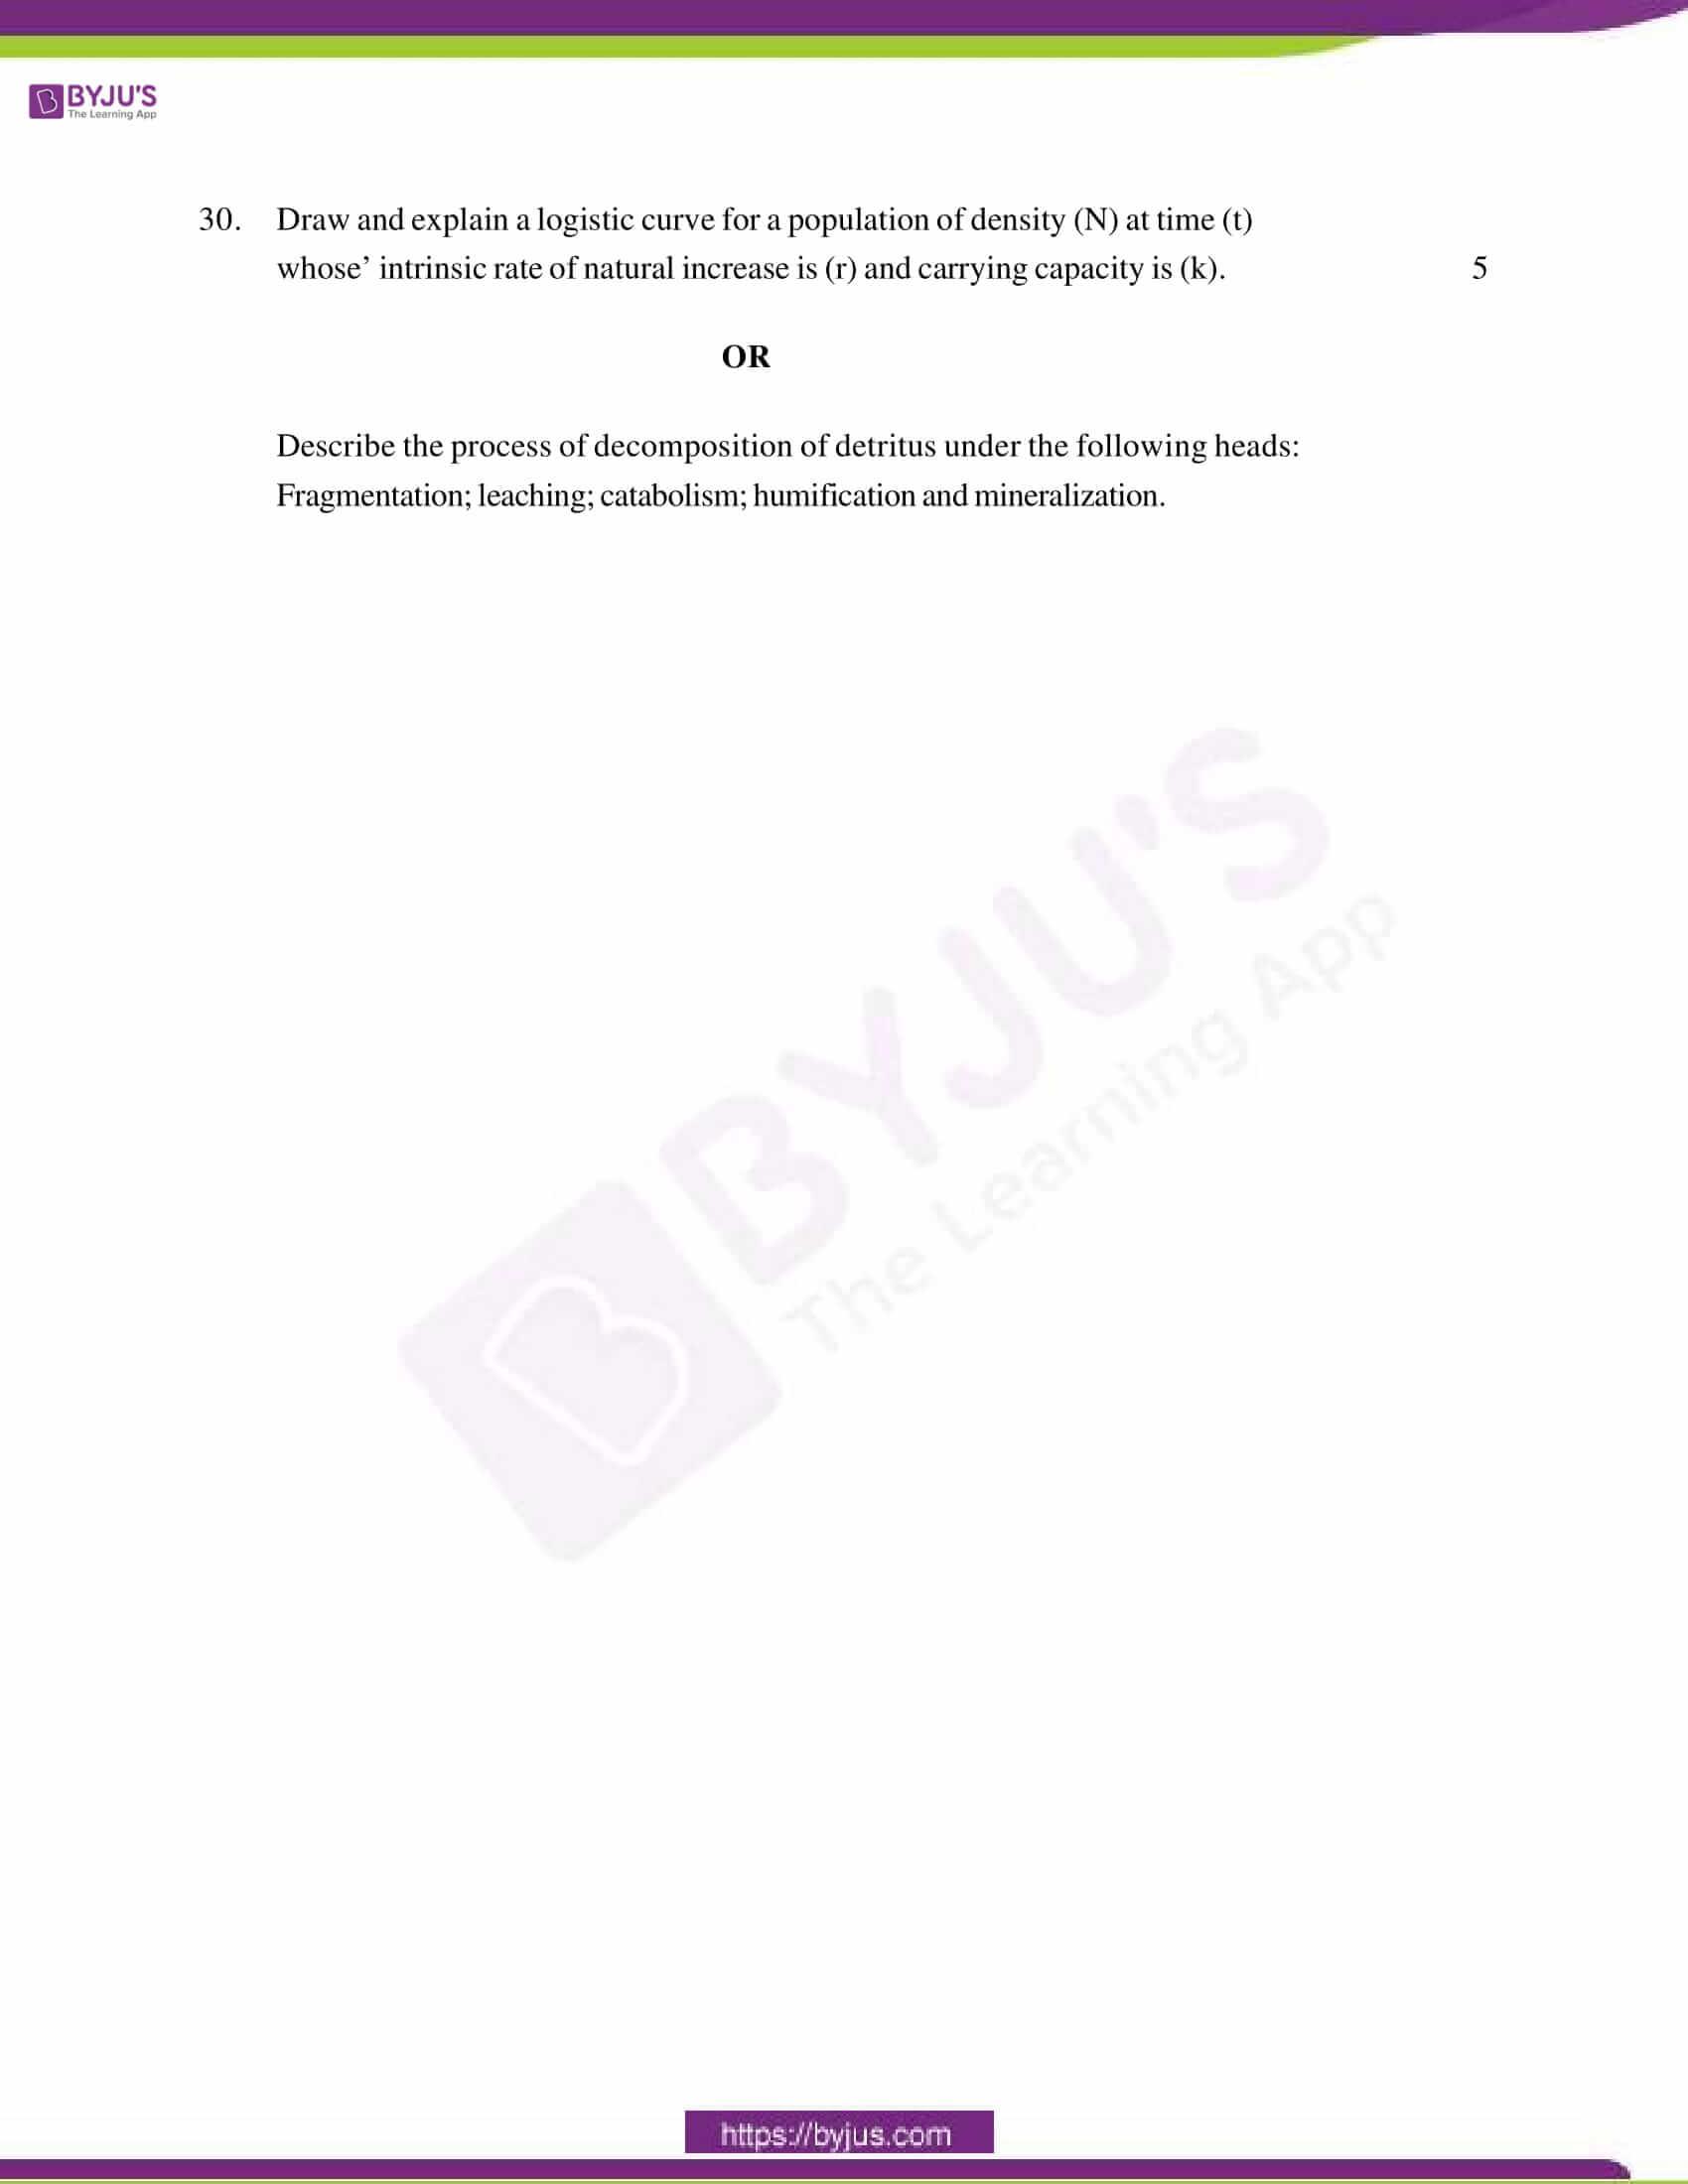 cbse class 12 qs paper 2013 bio set 1